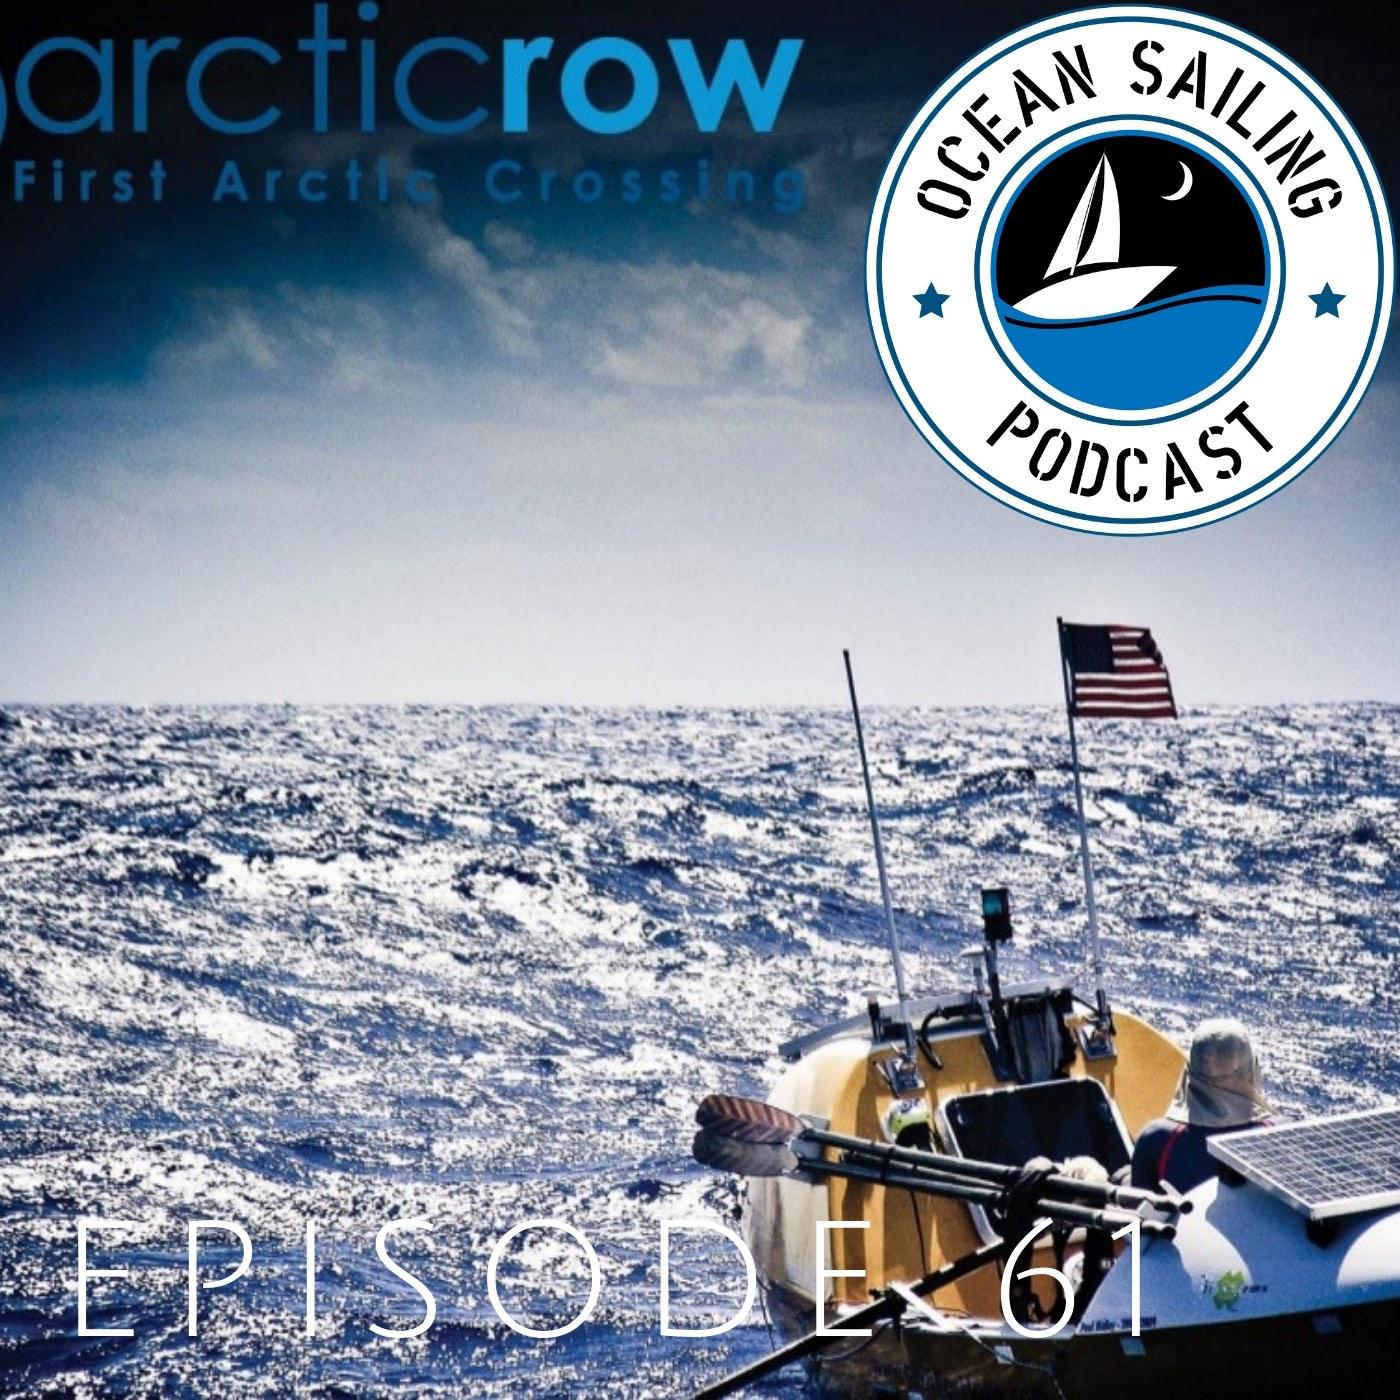 Paul Ridley Arctic Atlantic Ocean Rower